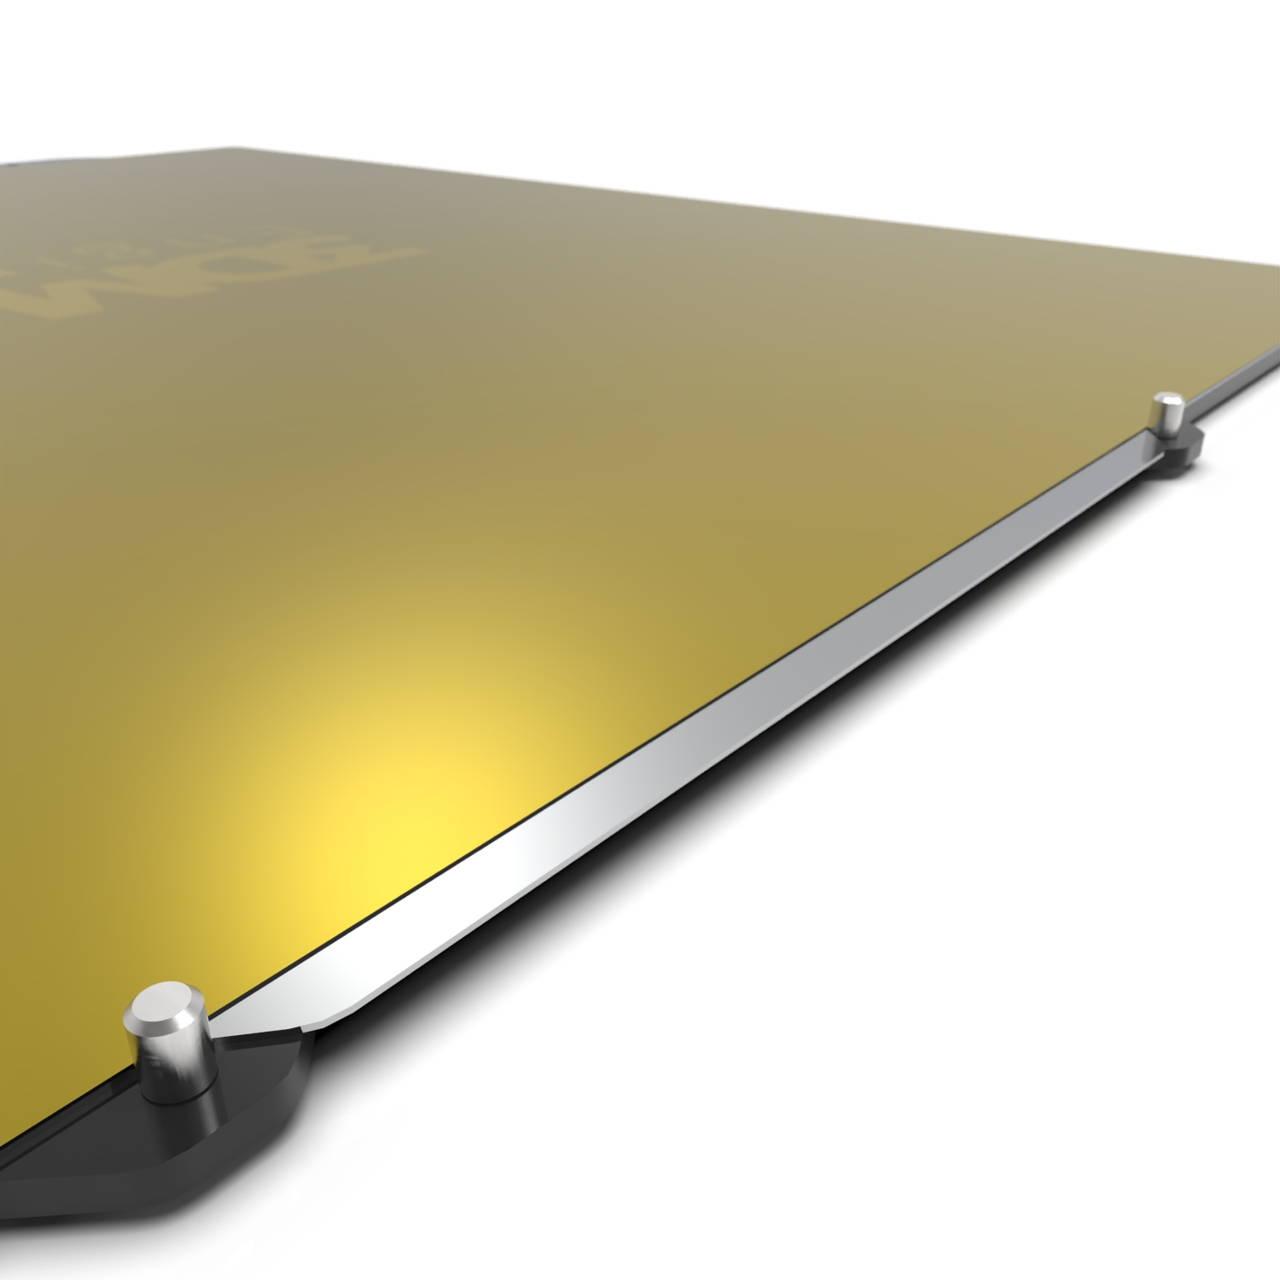 3D Printer PEI Flex Plate System